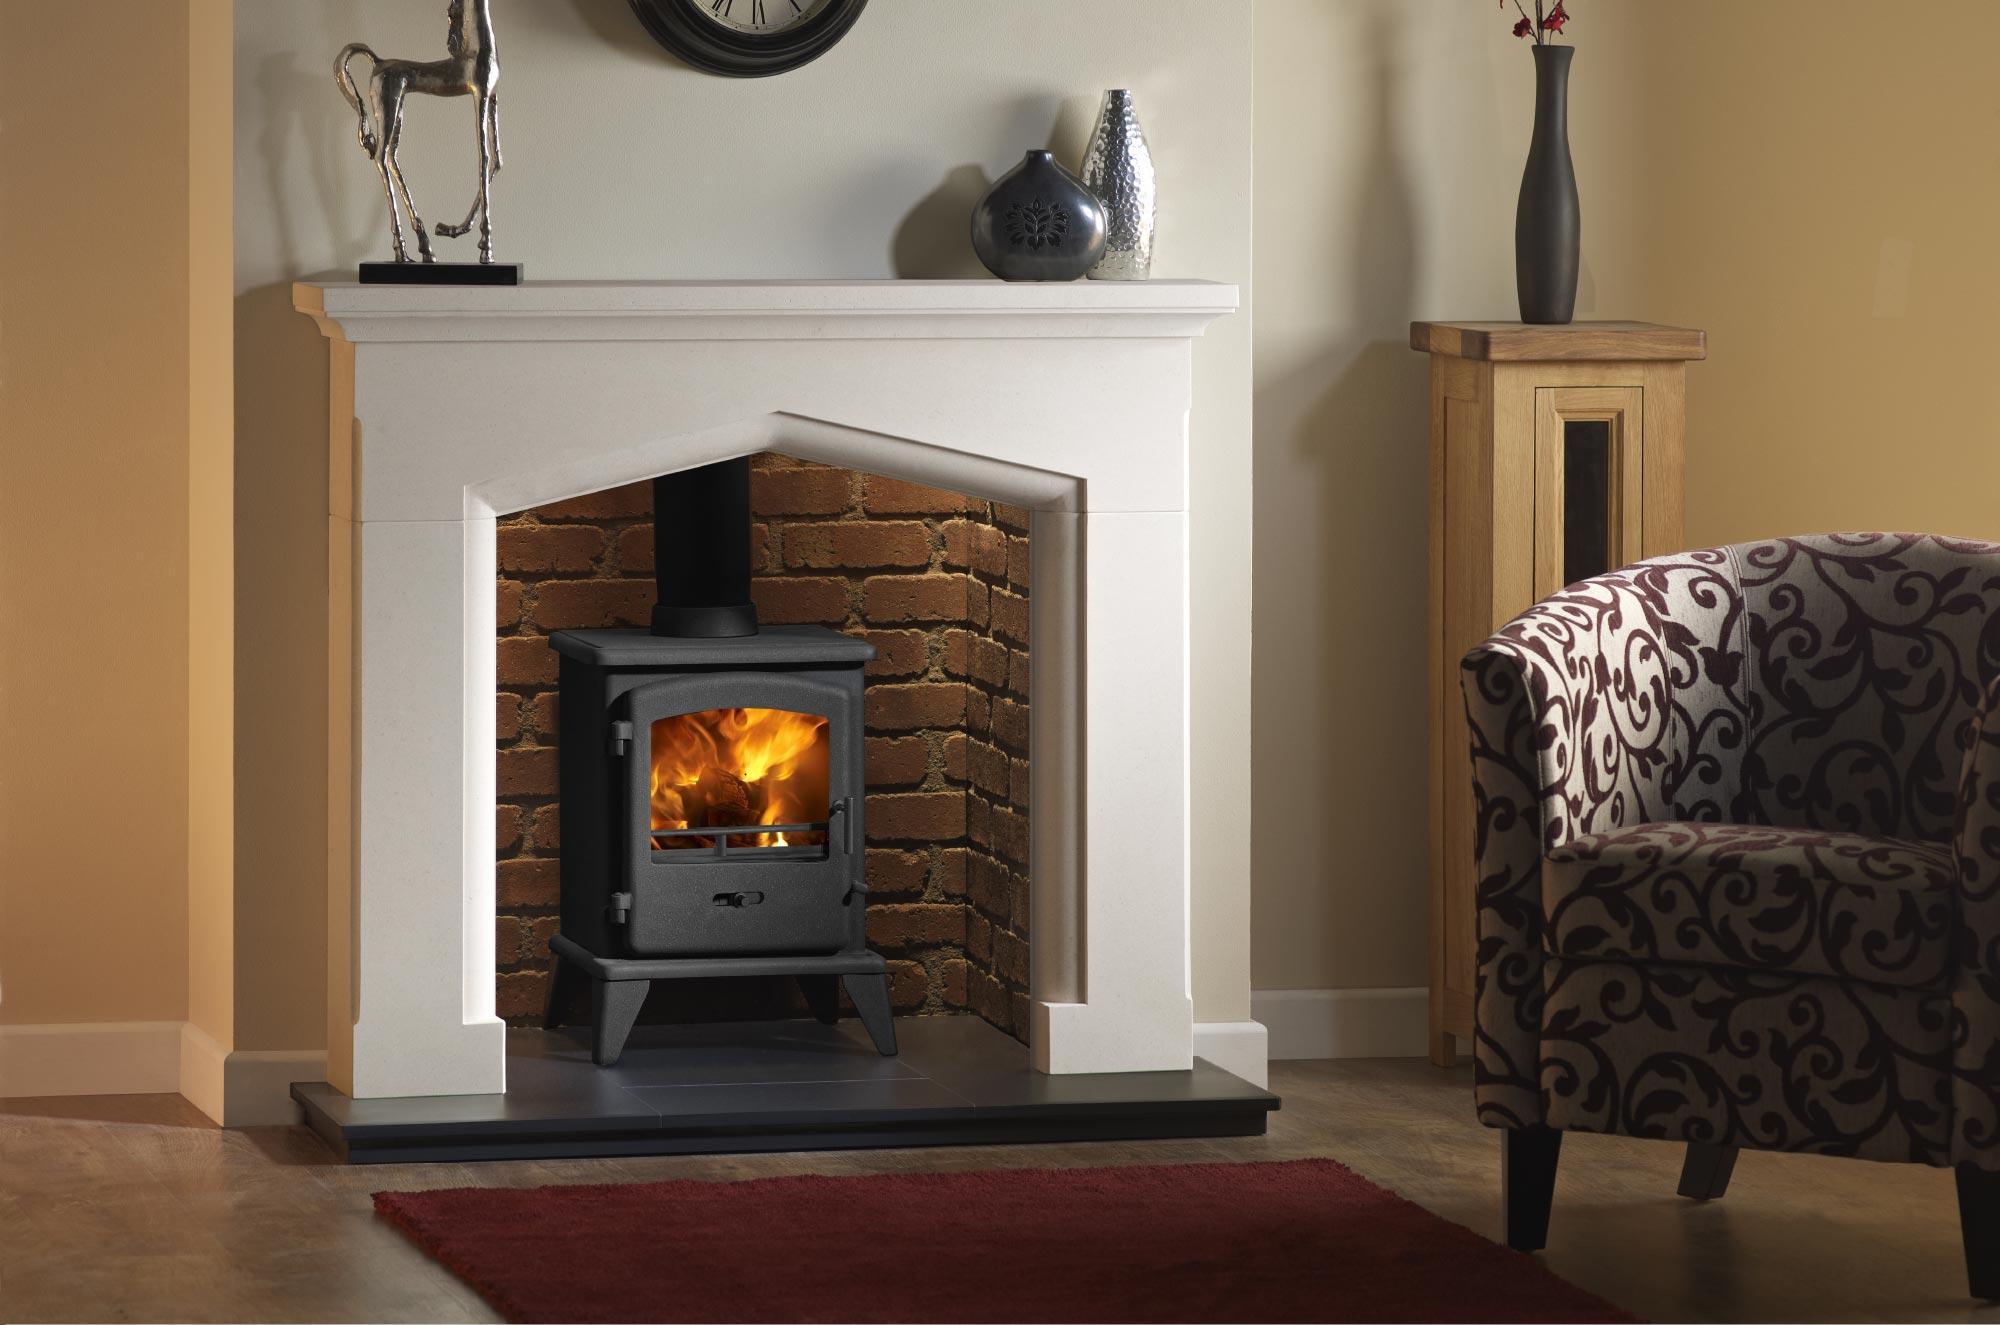 100+ [ Fireplace ] | Best 25 Wedding Fireplace Ideas On ...